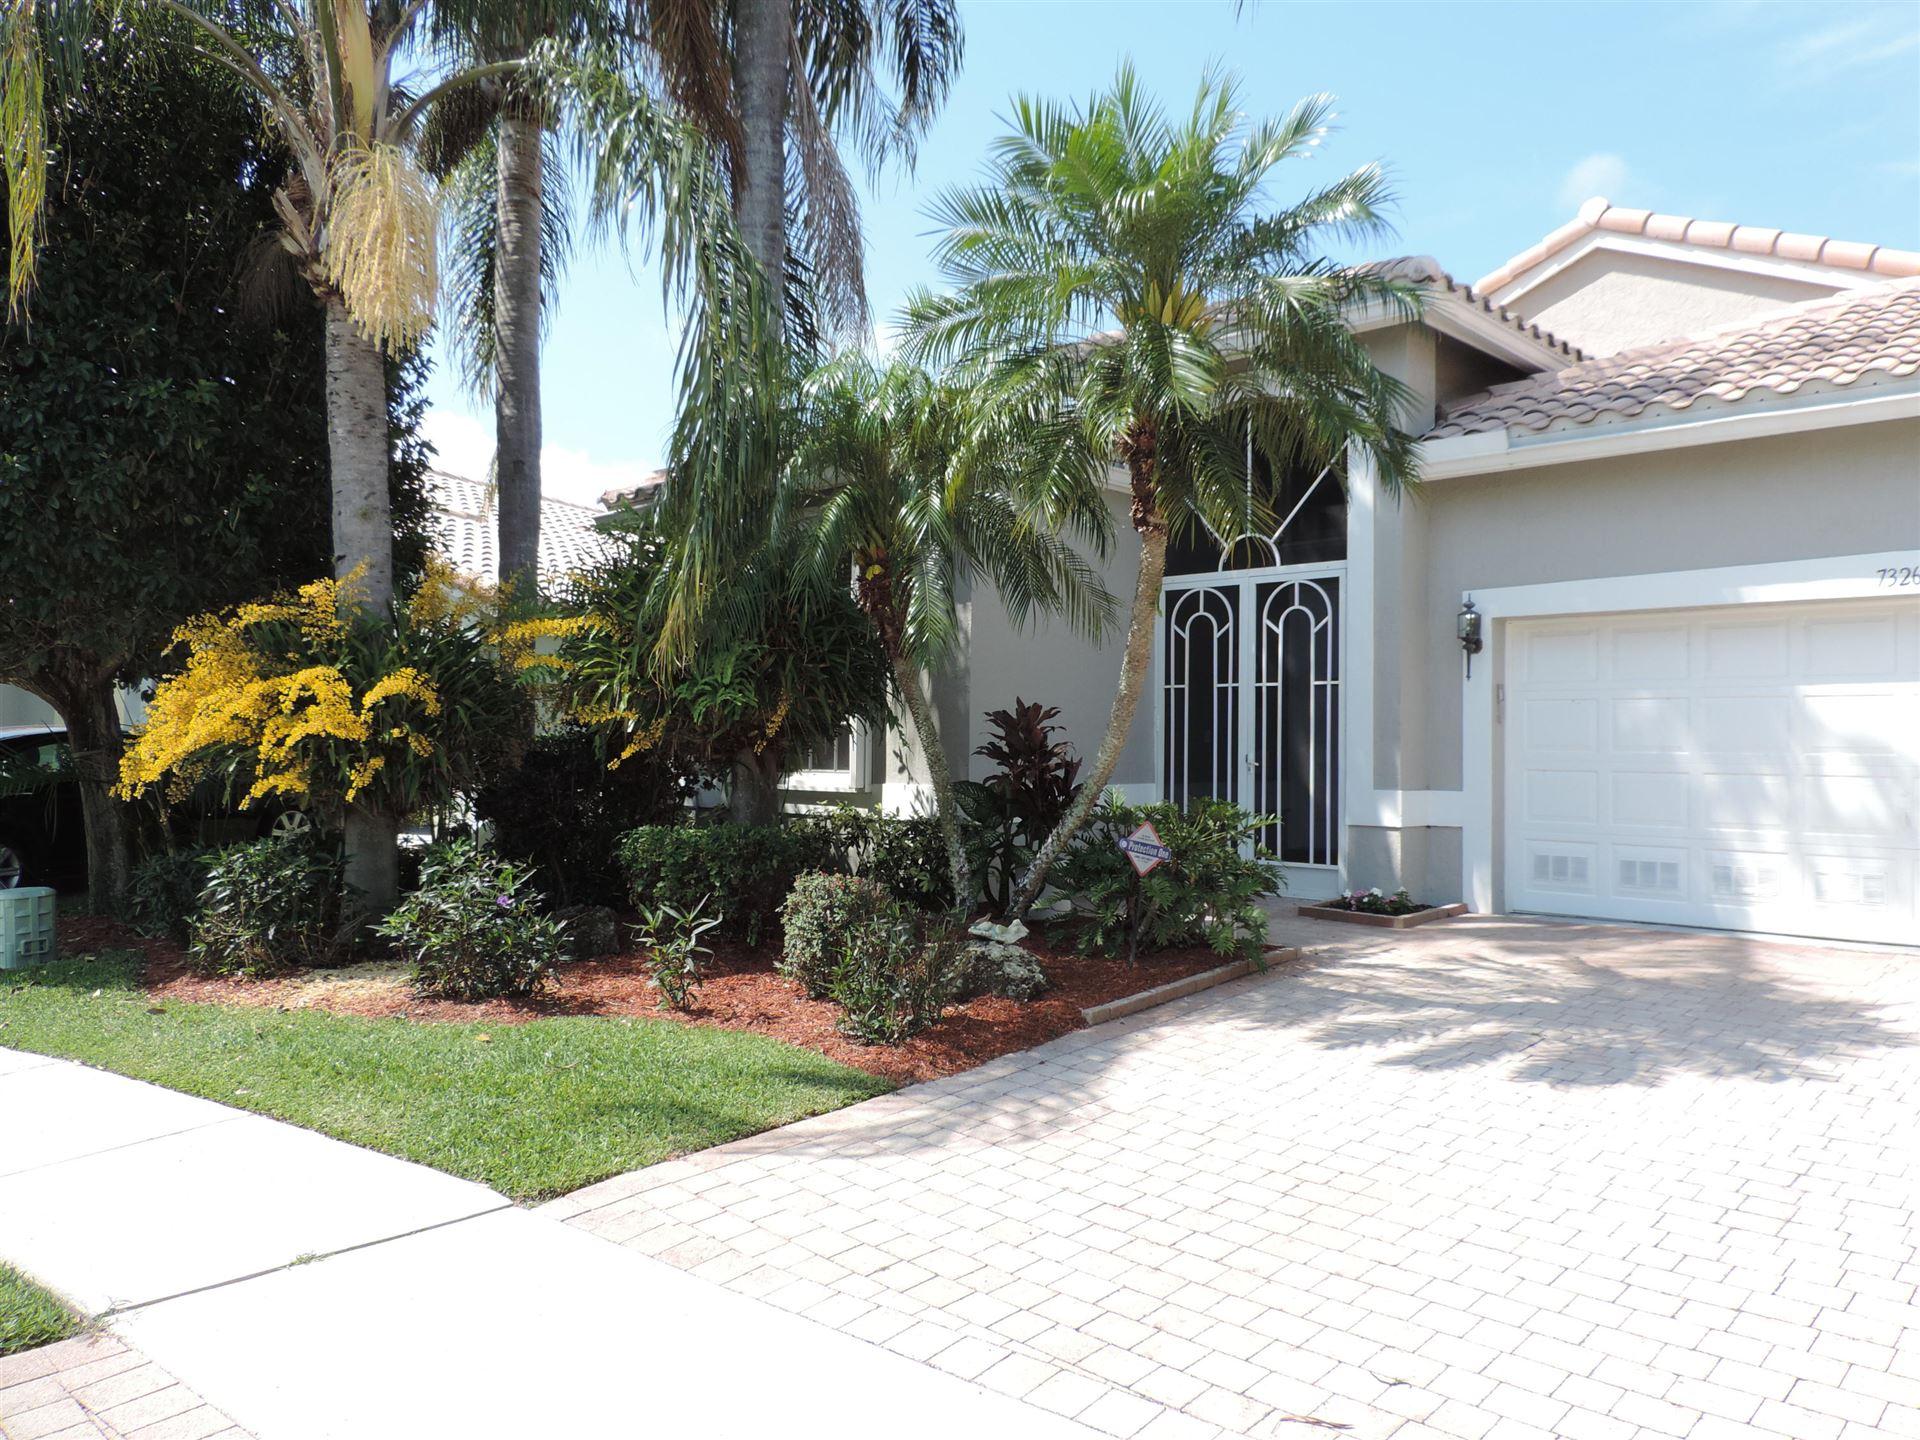 7326 Toscane Court, Boynton Beach, FL 33437 - #: RX-10708655